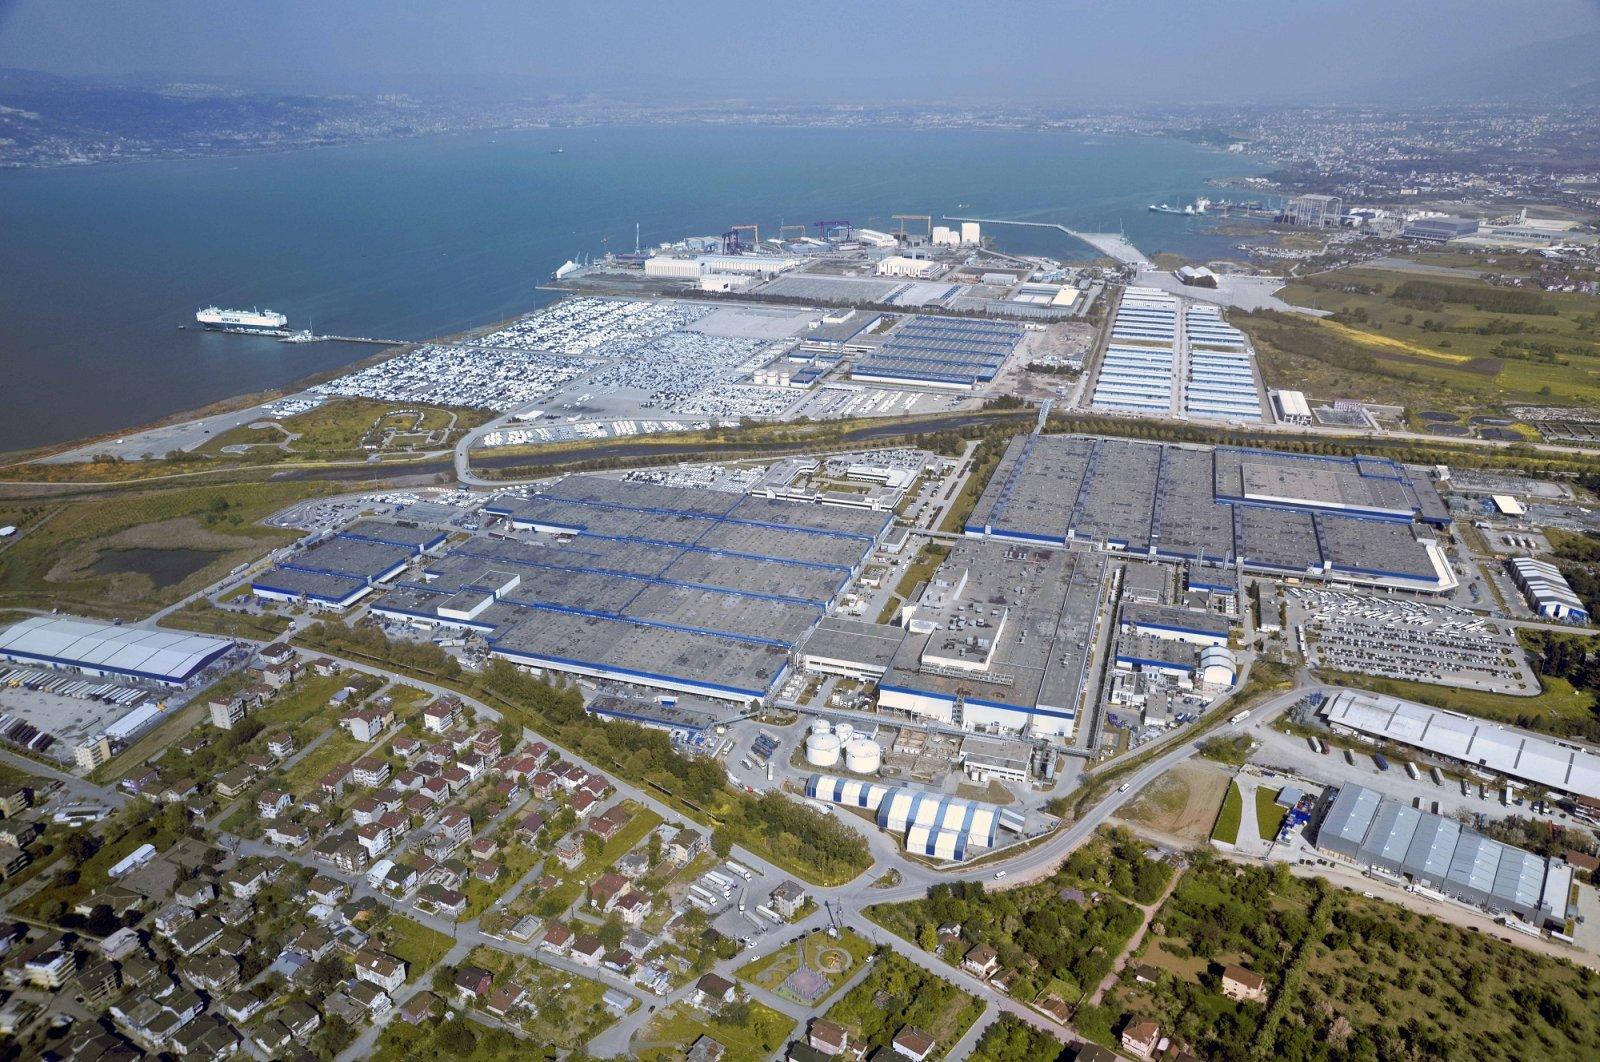 The Ford Otosan plant is seen in this aerial photo, Gölcük, Kocaeli, northwestern, Turkey, Dec. 5, 2020. (Photo courtesy of Ford Otosan)